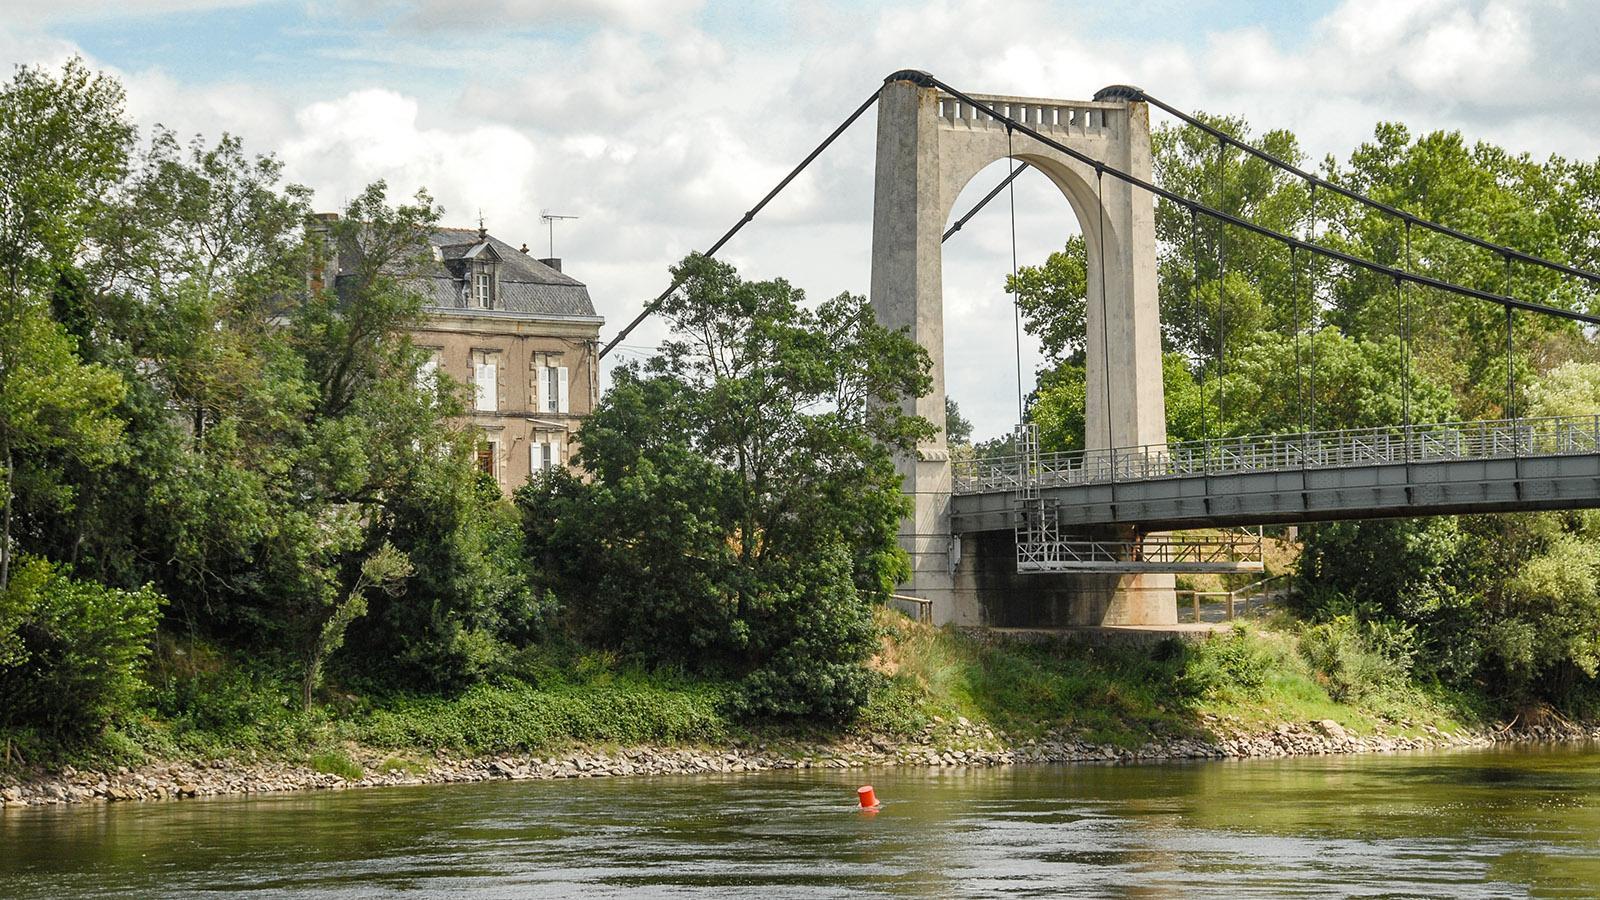 Die Loirebrücke bei Chalonnes-sur-Loire. Foto: Hilke Maunder